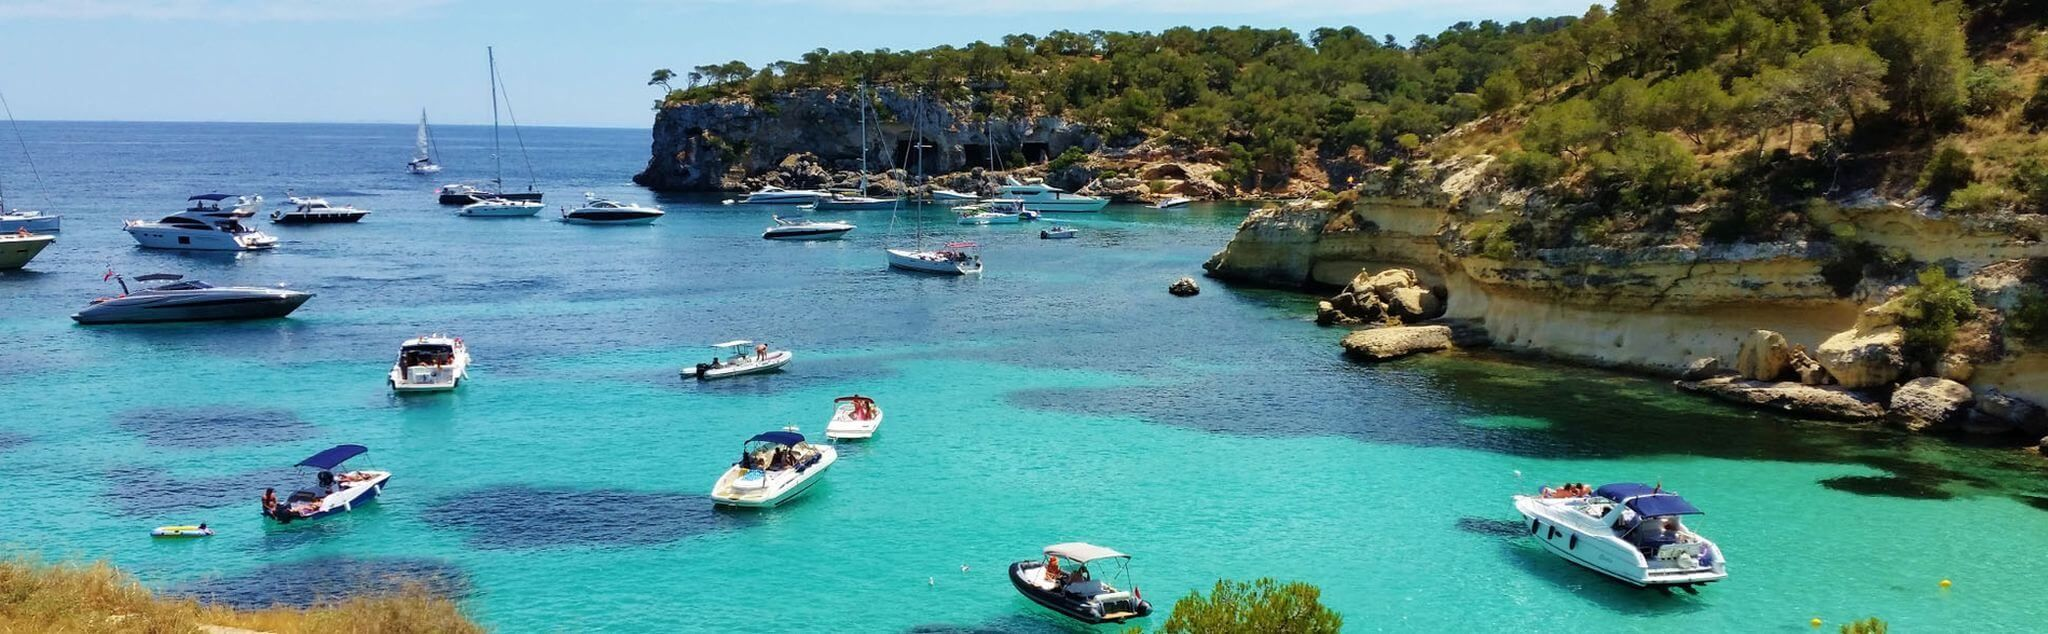 Voli Aereo en Islas Baleares